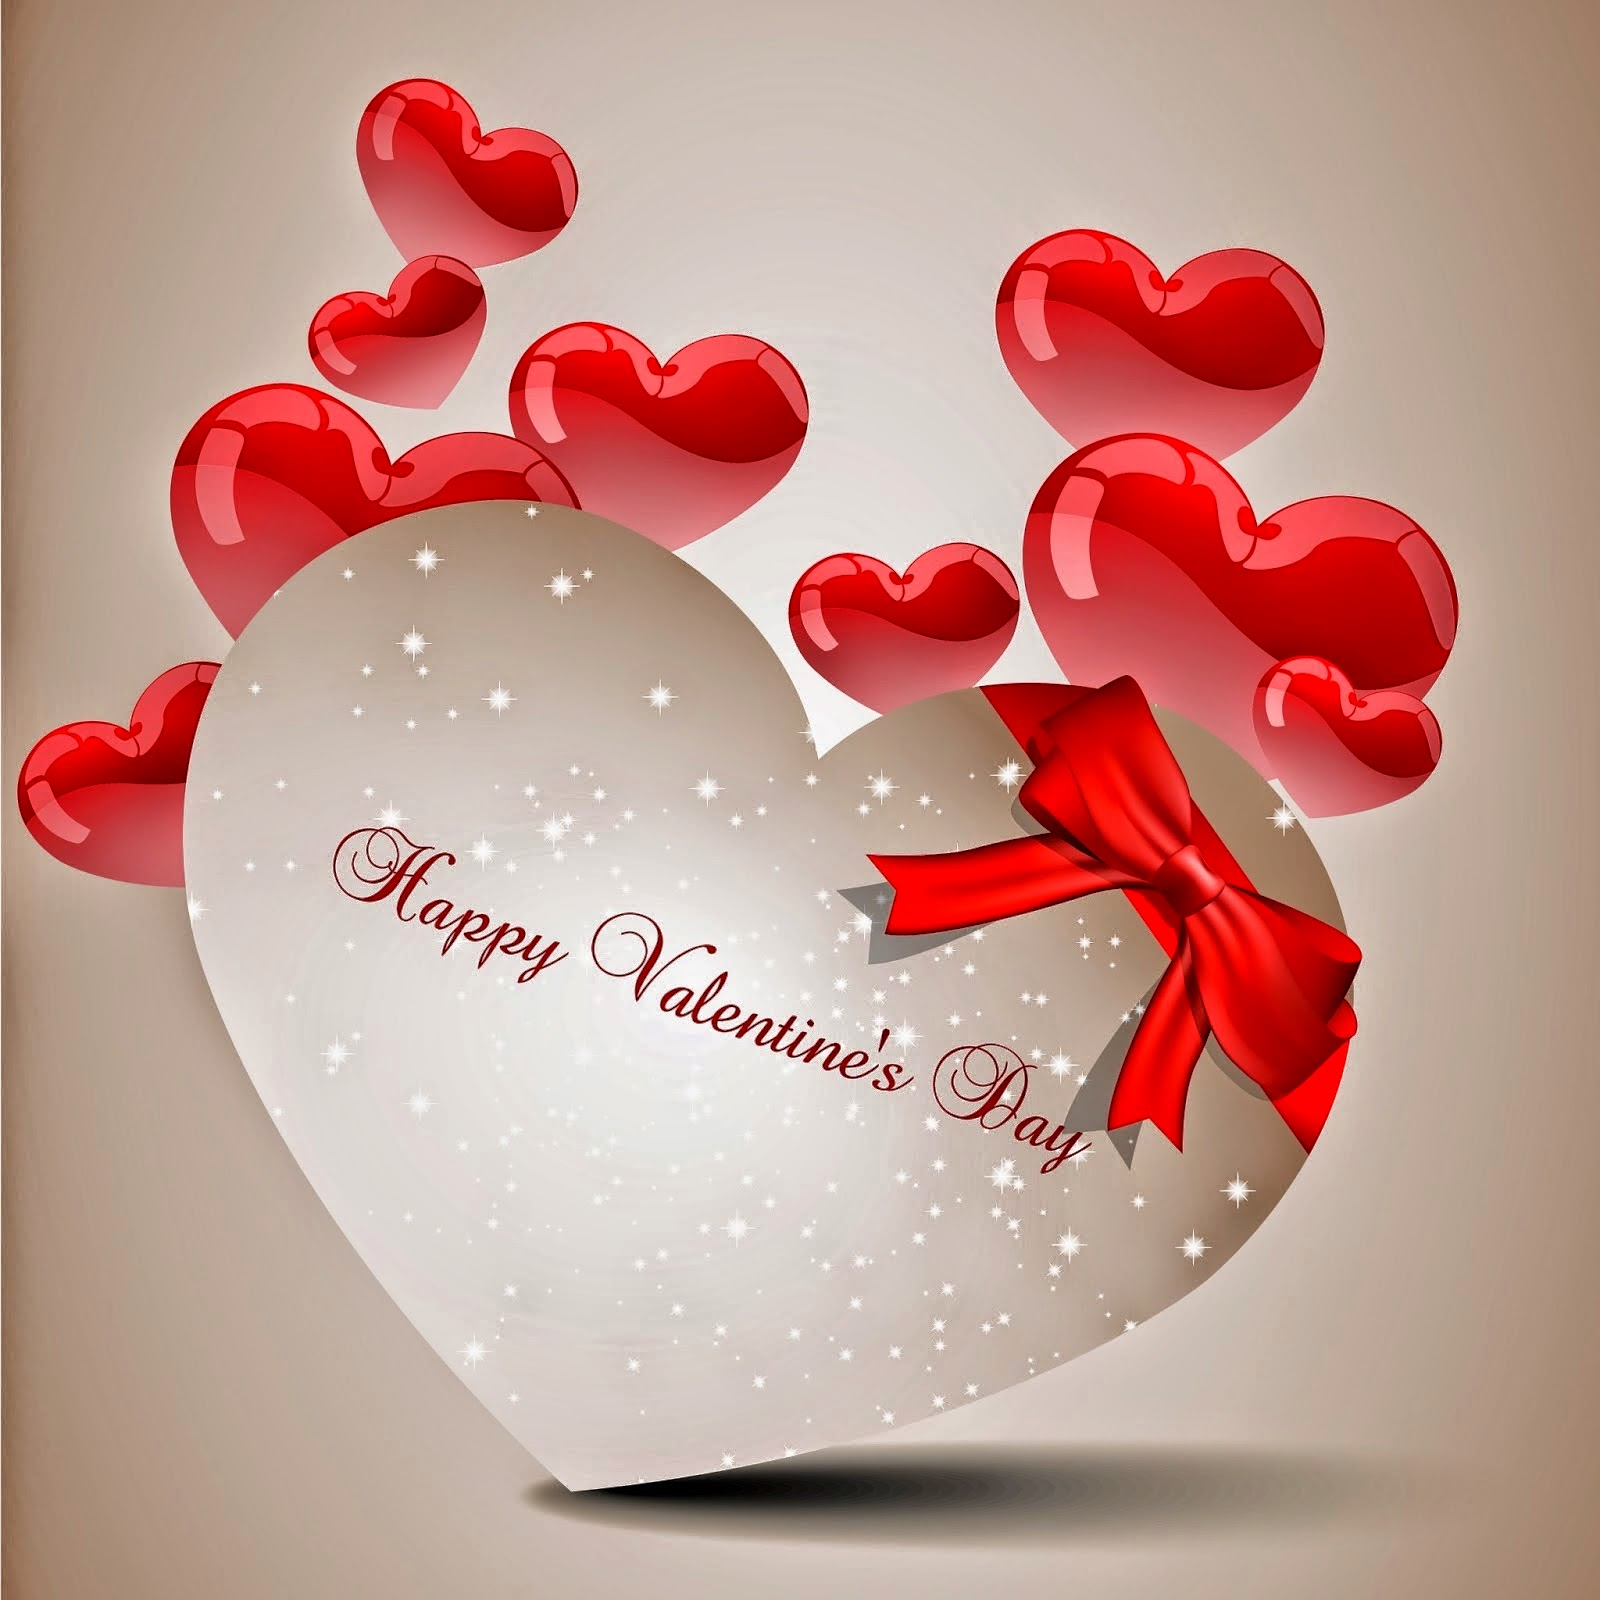 happy valentine's day 2015 wallpaper images hd « happy valentine day